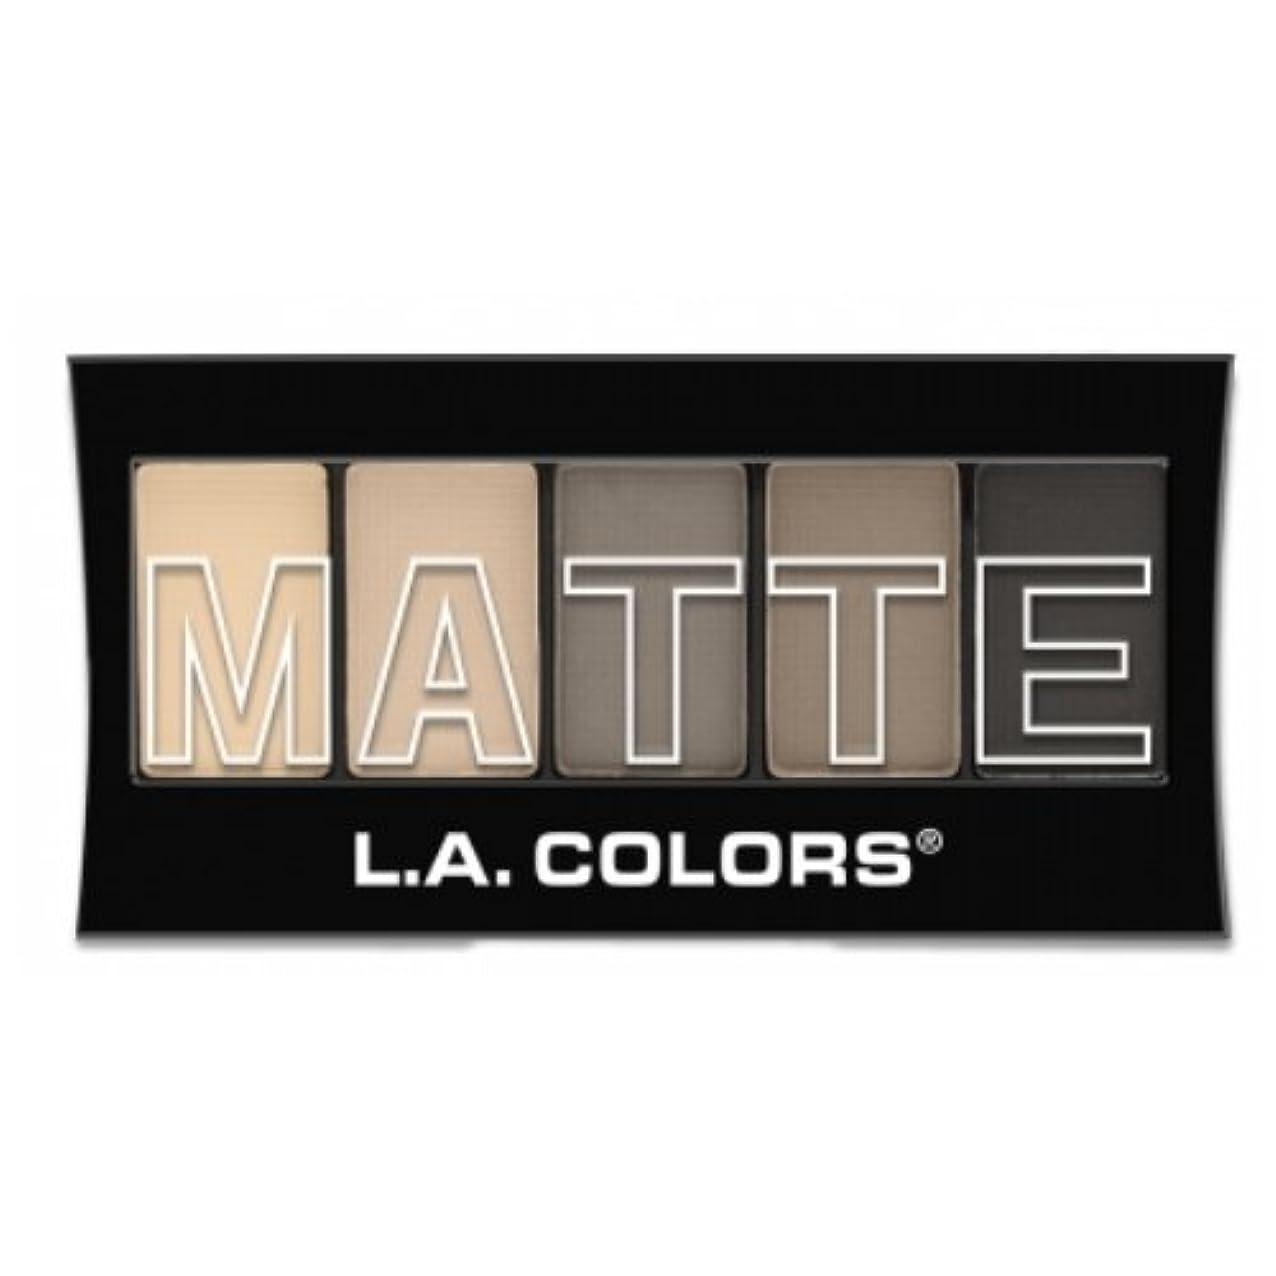 一緒責任者腐敗(3 Pack) L.A. Colors Matte Eyeshadow - Nude Suede (並行輸入品)